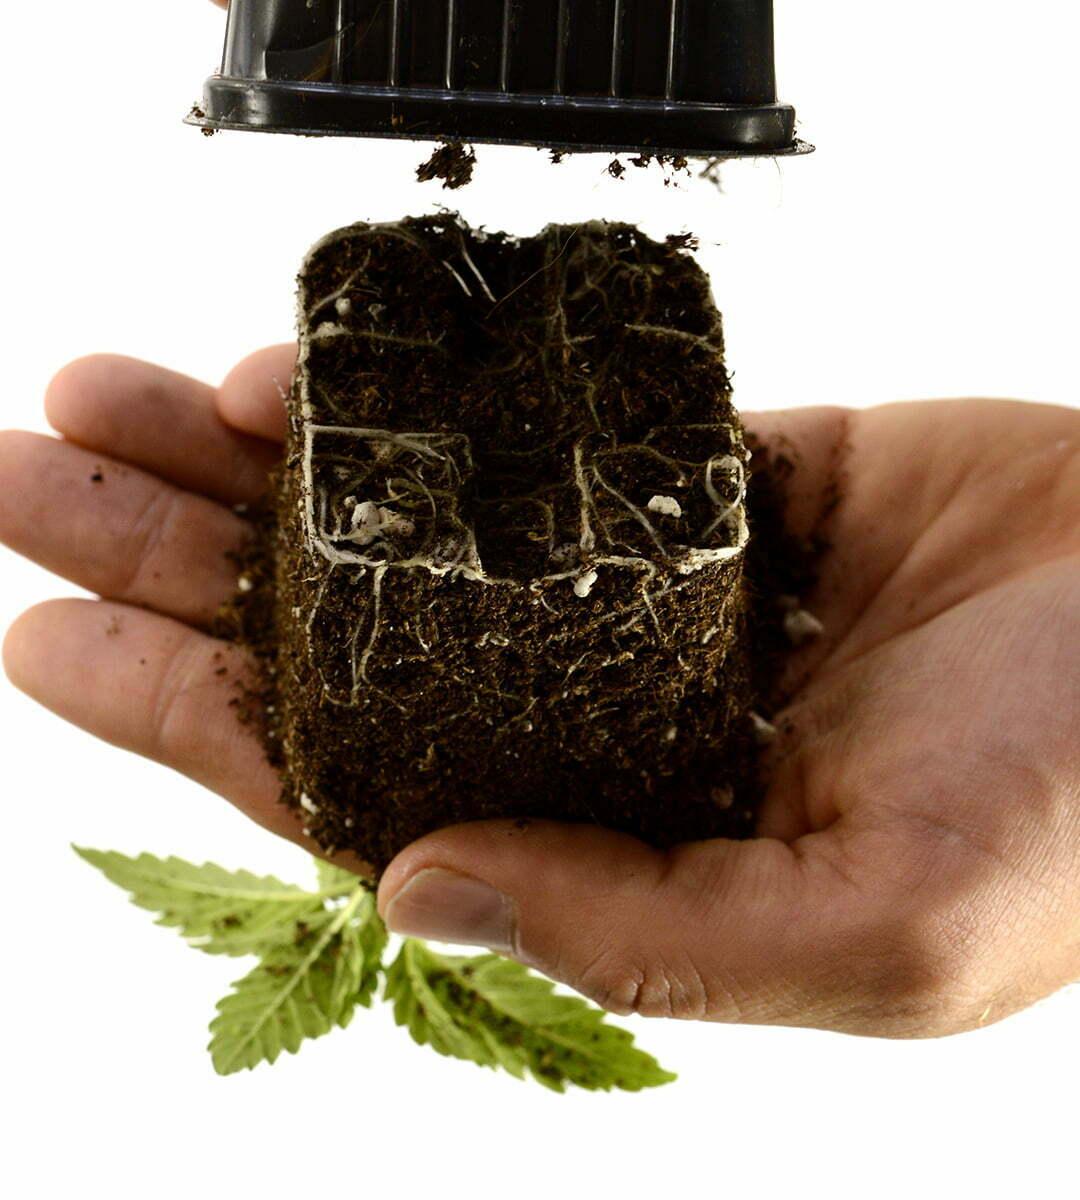 Transplant cannabis